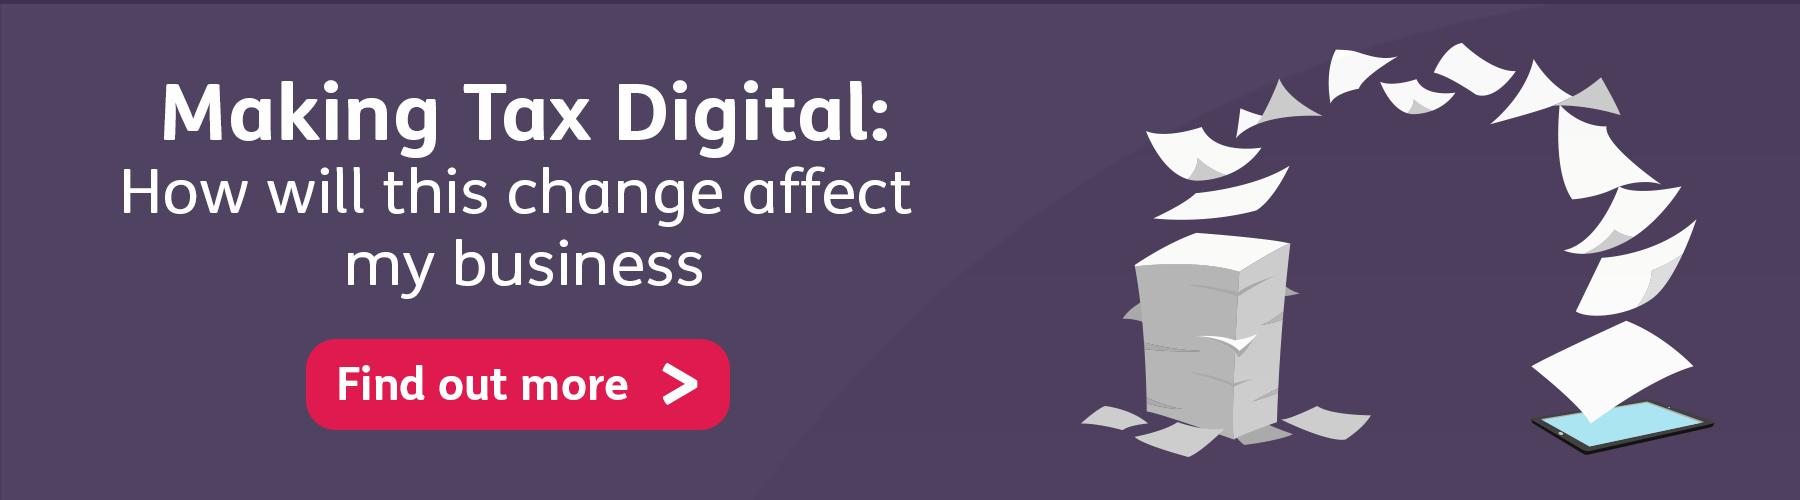 Making Tax Digital blog banner